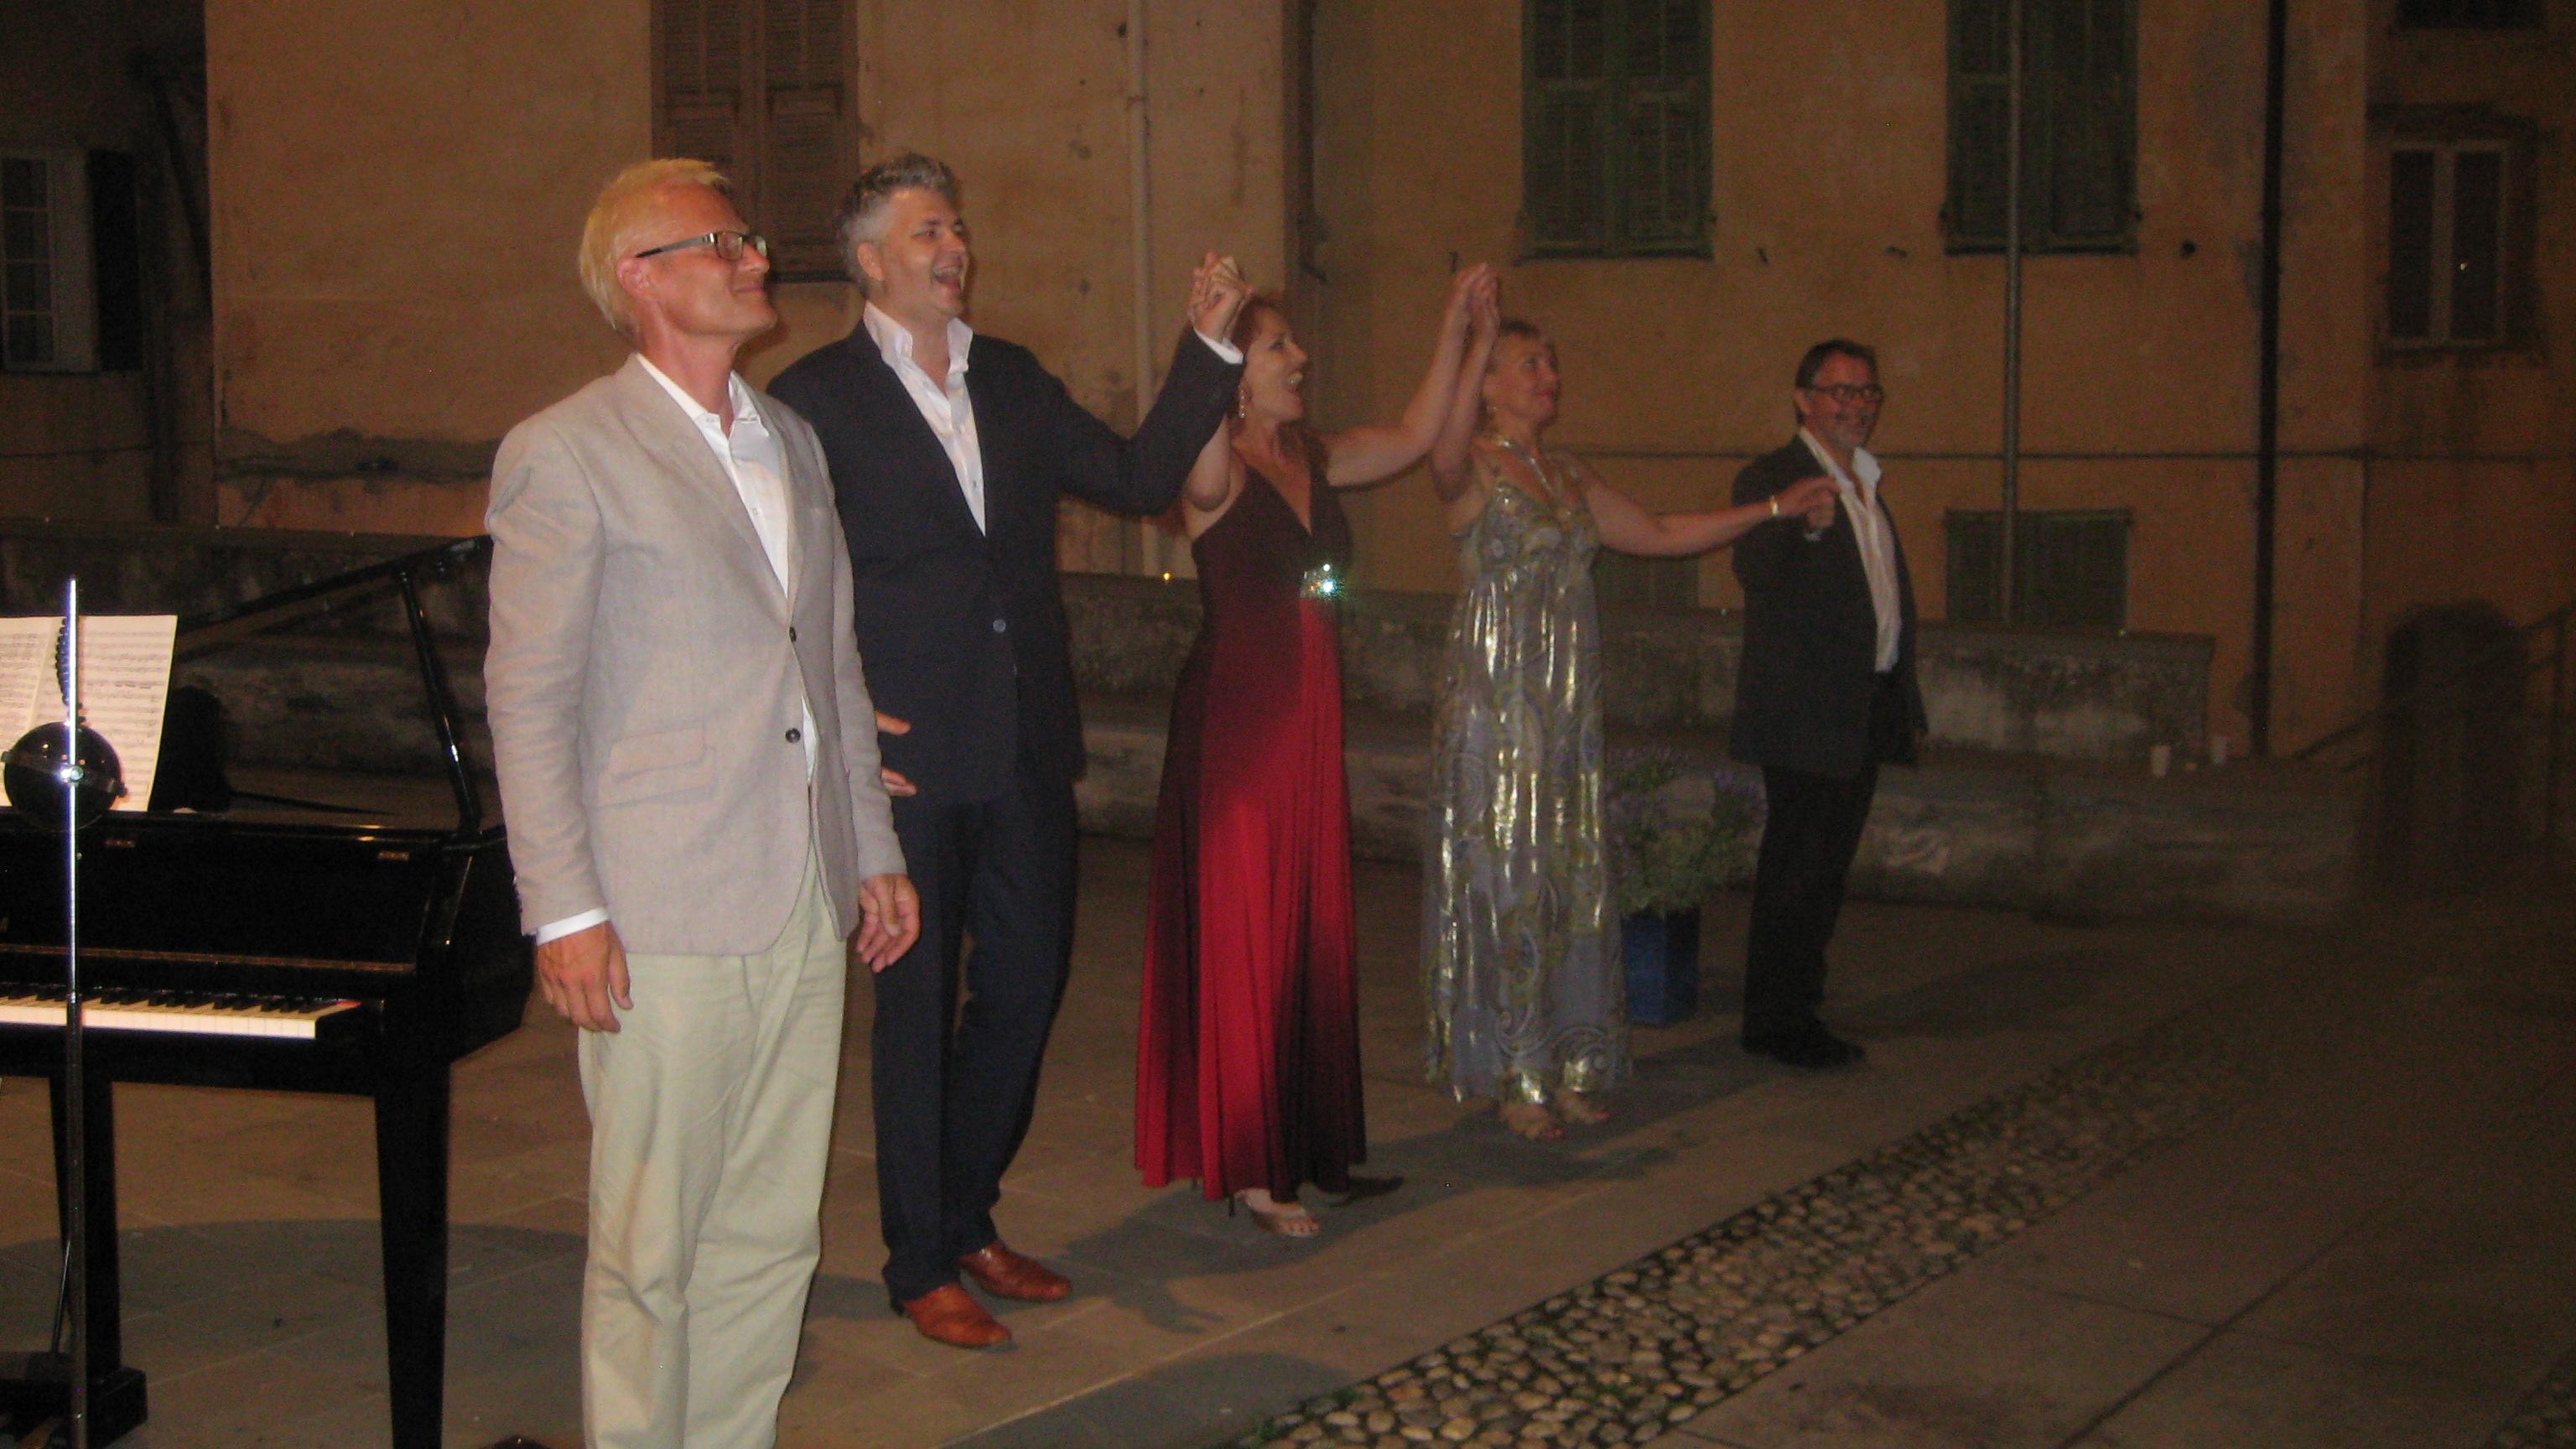 Helene Gjerris, Elsebeth Dreisig, Jørn Pedersen, Thomas Præstegaard and Thomas Rischel